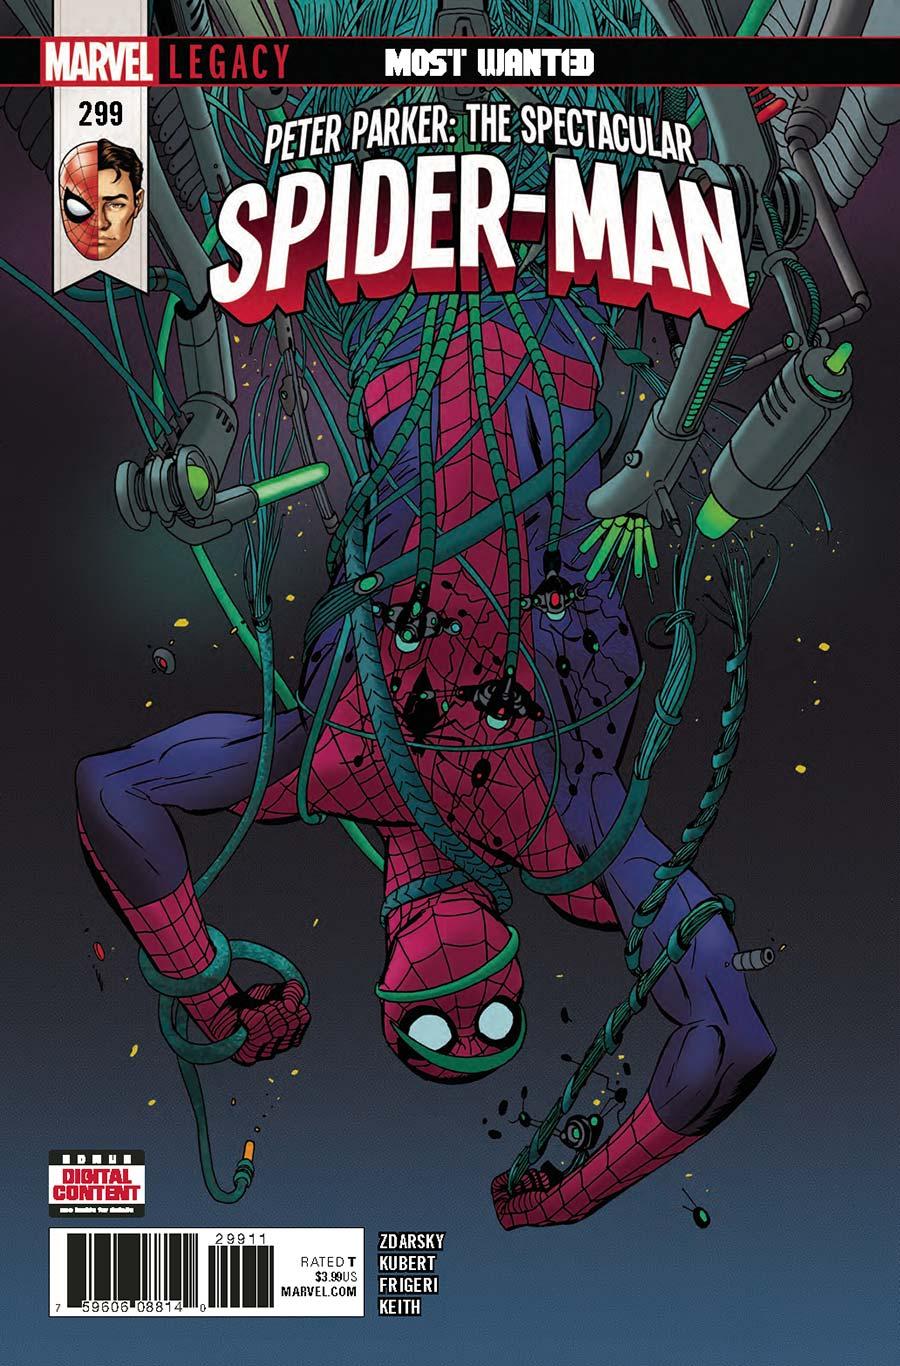 Peter Parker, The Spectacular Spider-Man